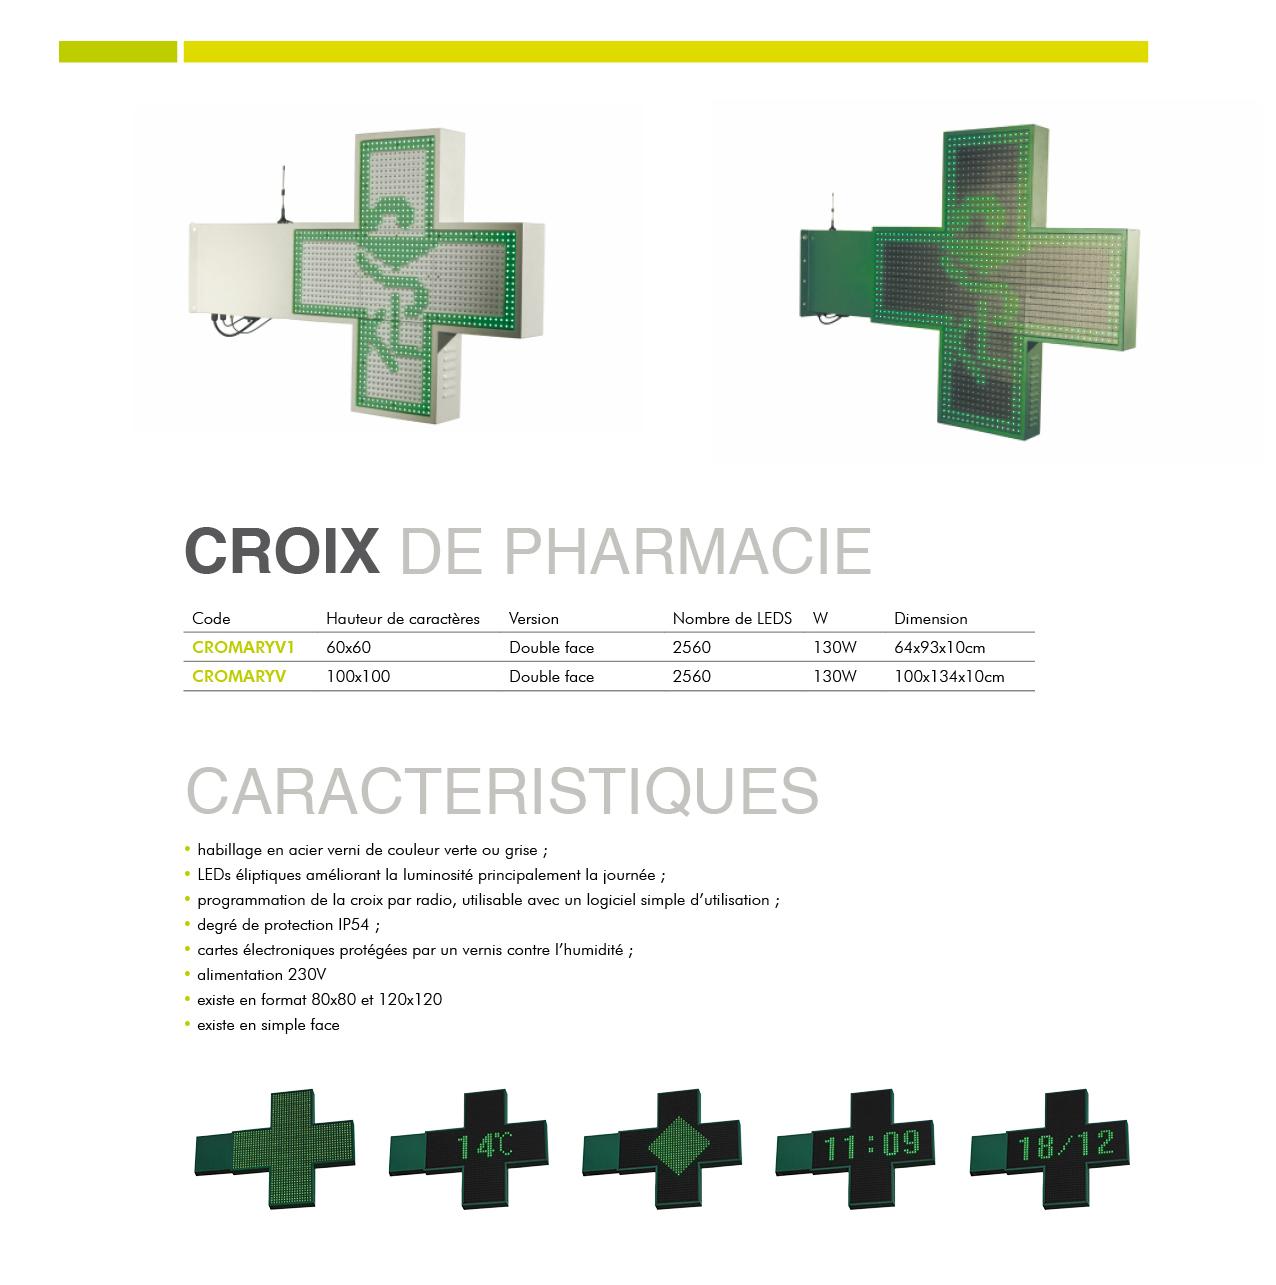 DEF-catalogue-gheury-23-06-2017172